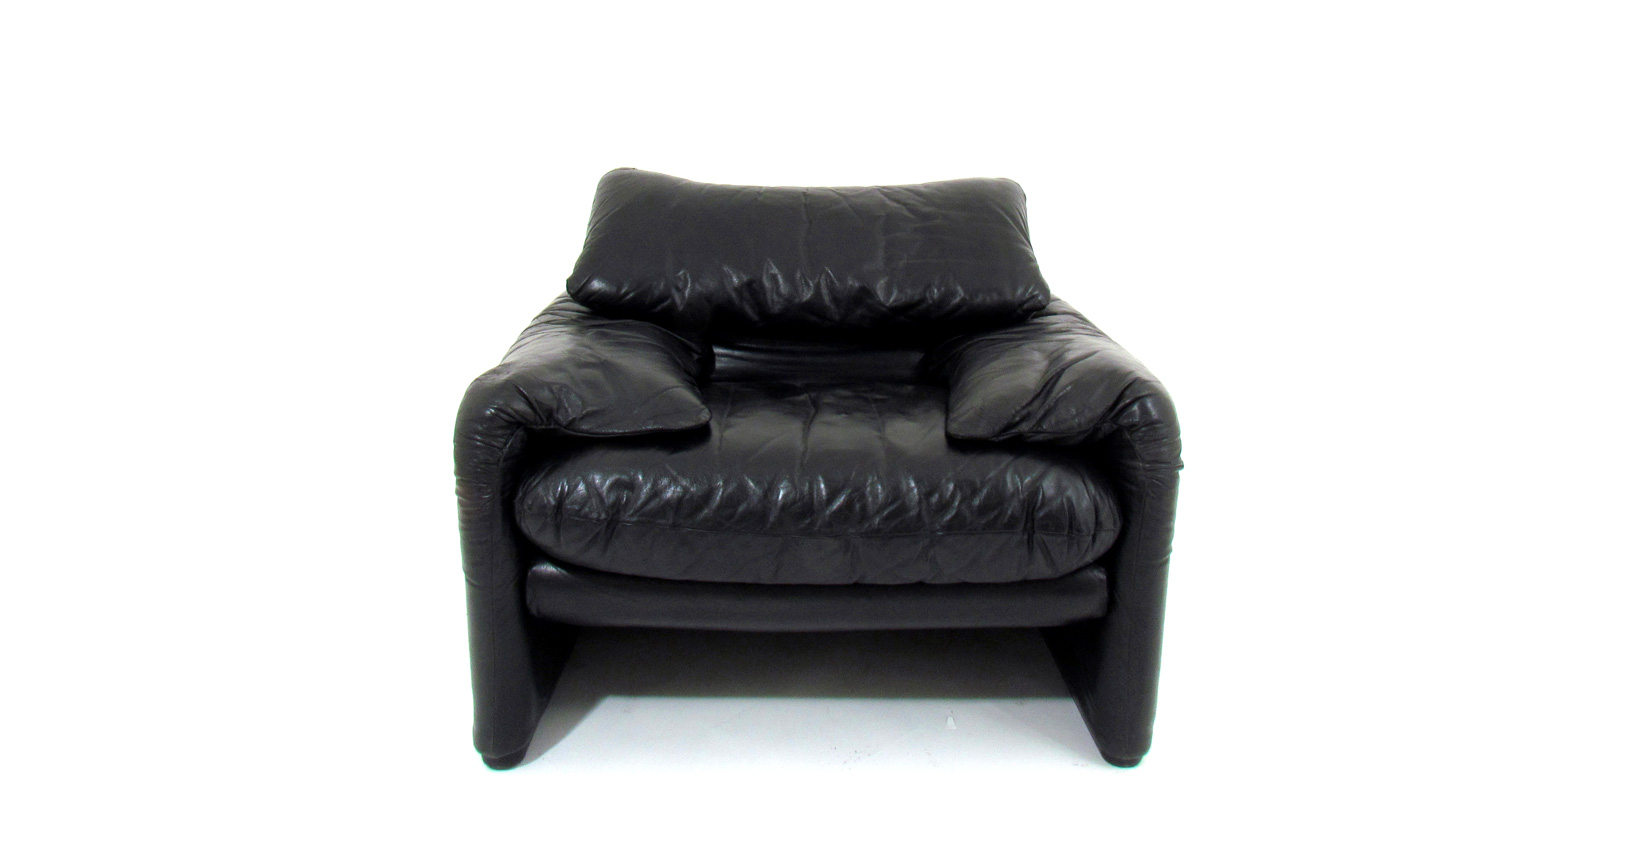 Maralunga armchairs poltrona leather pelle magistretti cassina compasso d'oro